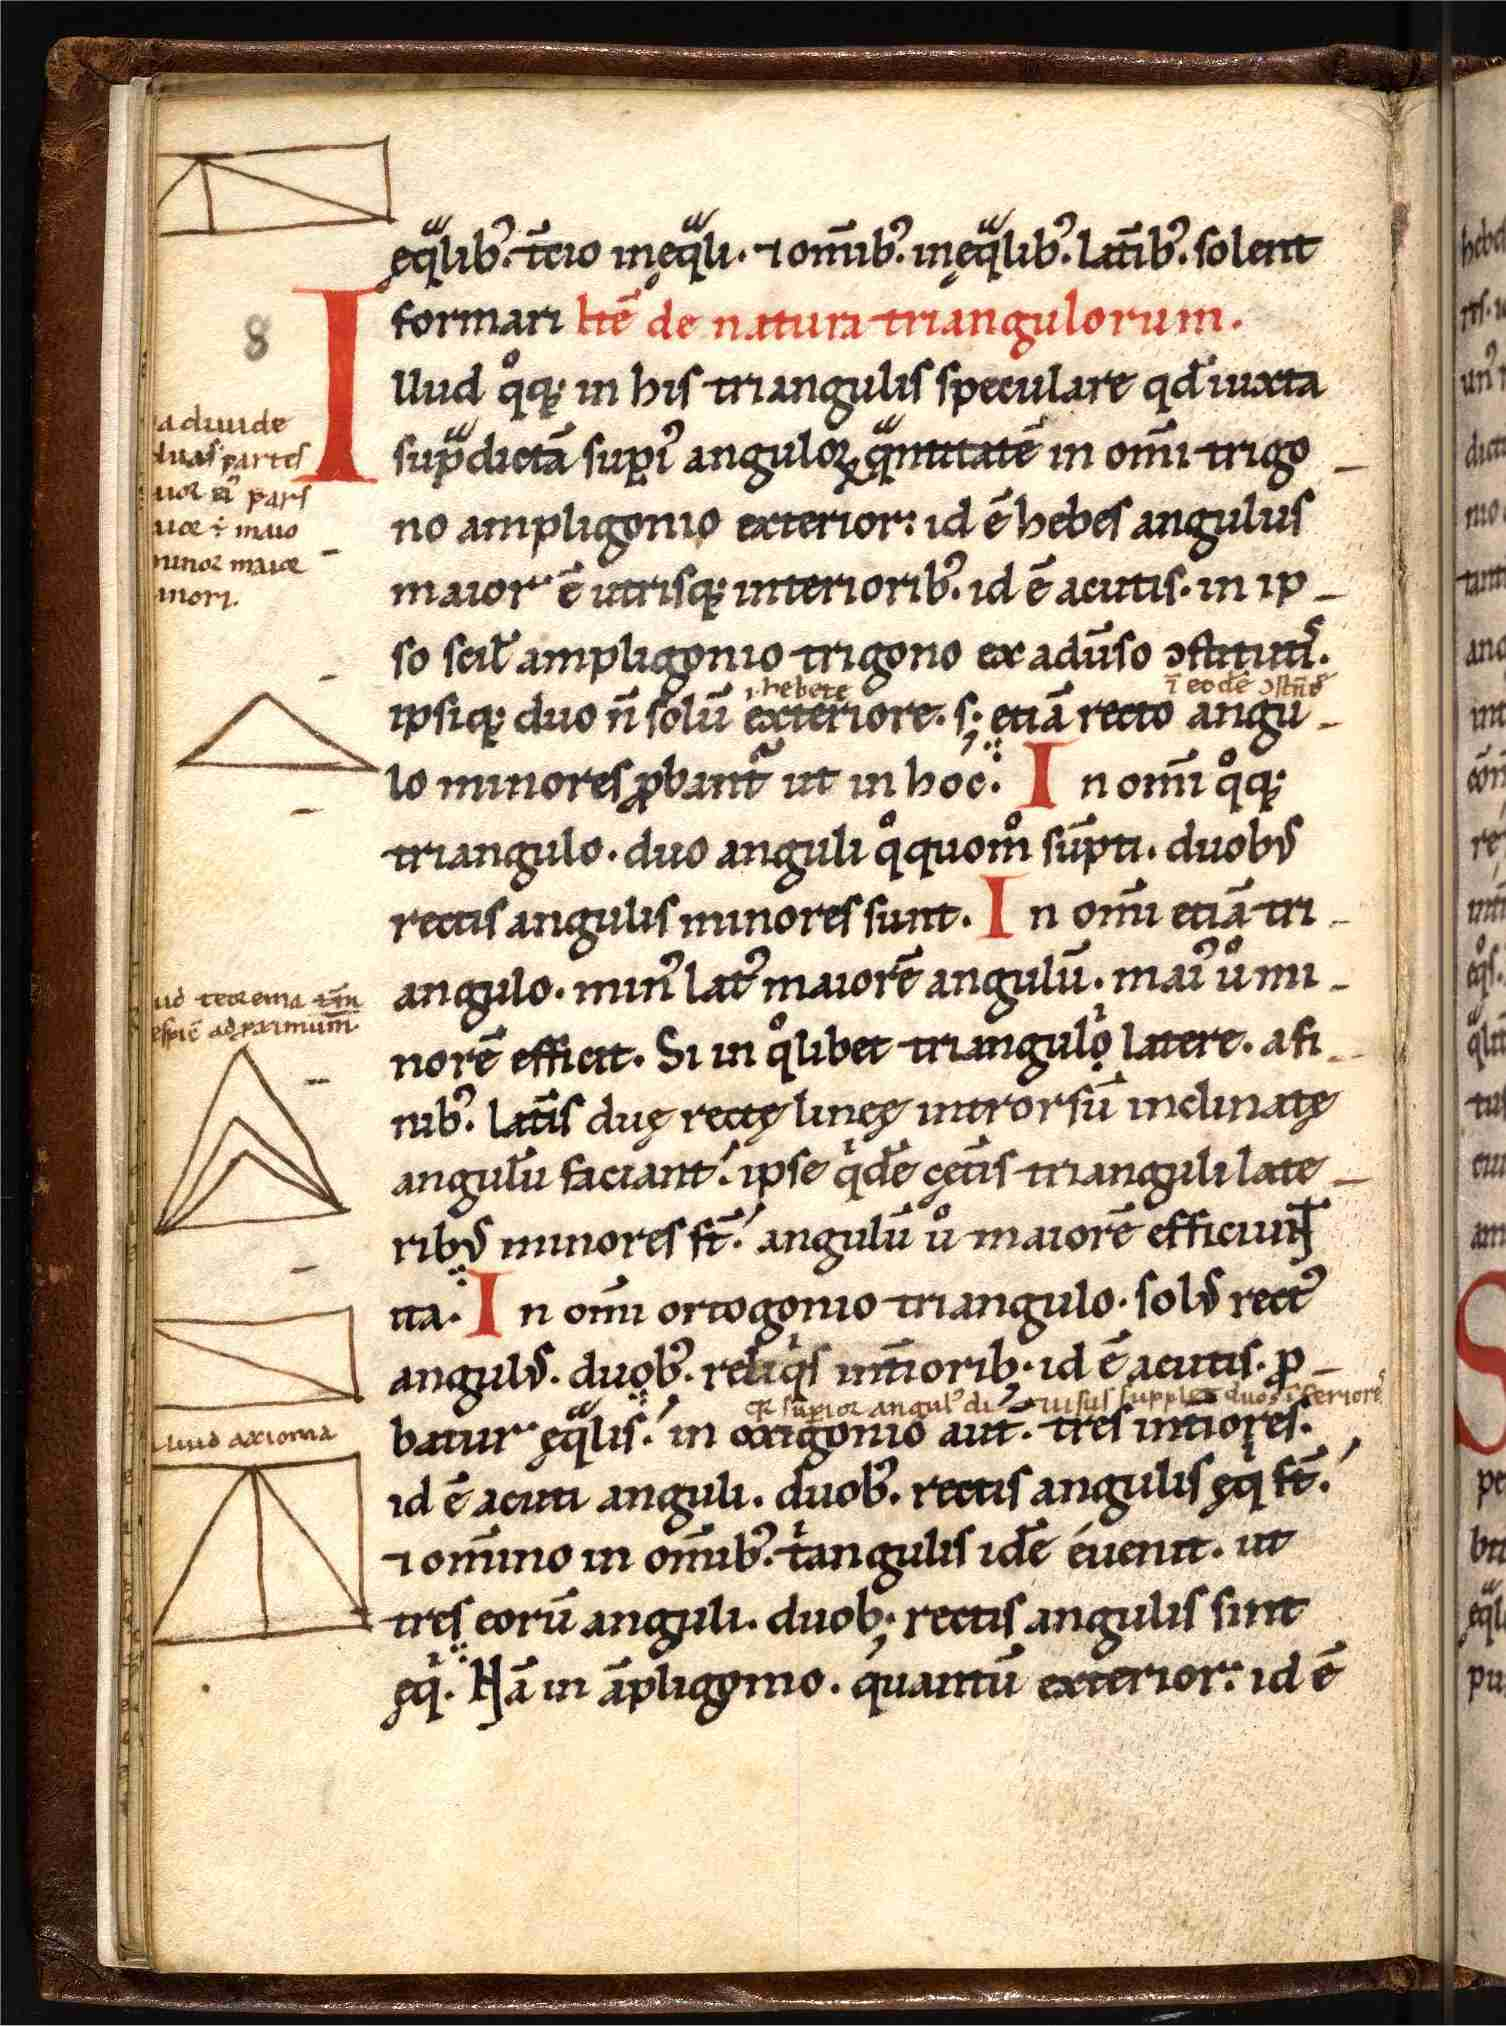 http://upload.wikimedia.org/wikipedia/commons/4/42/Pope_Sylvester_II_(Gerbert_d%27Aurillac)_-_De_geometria.jpg